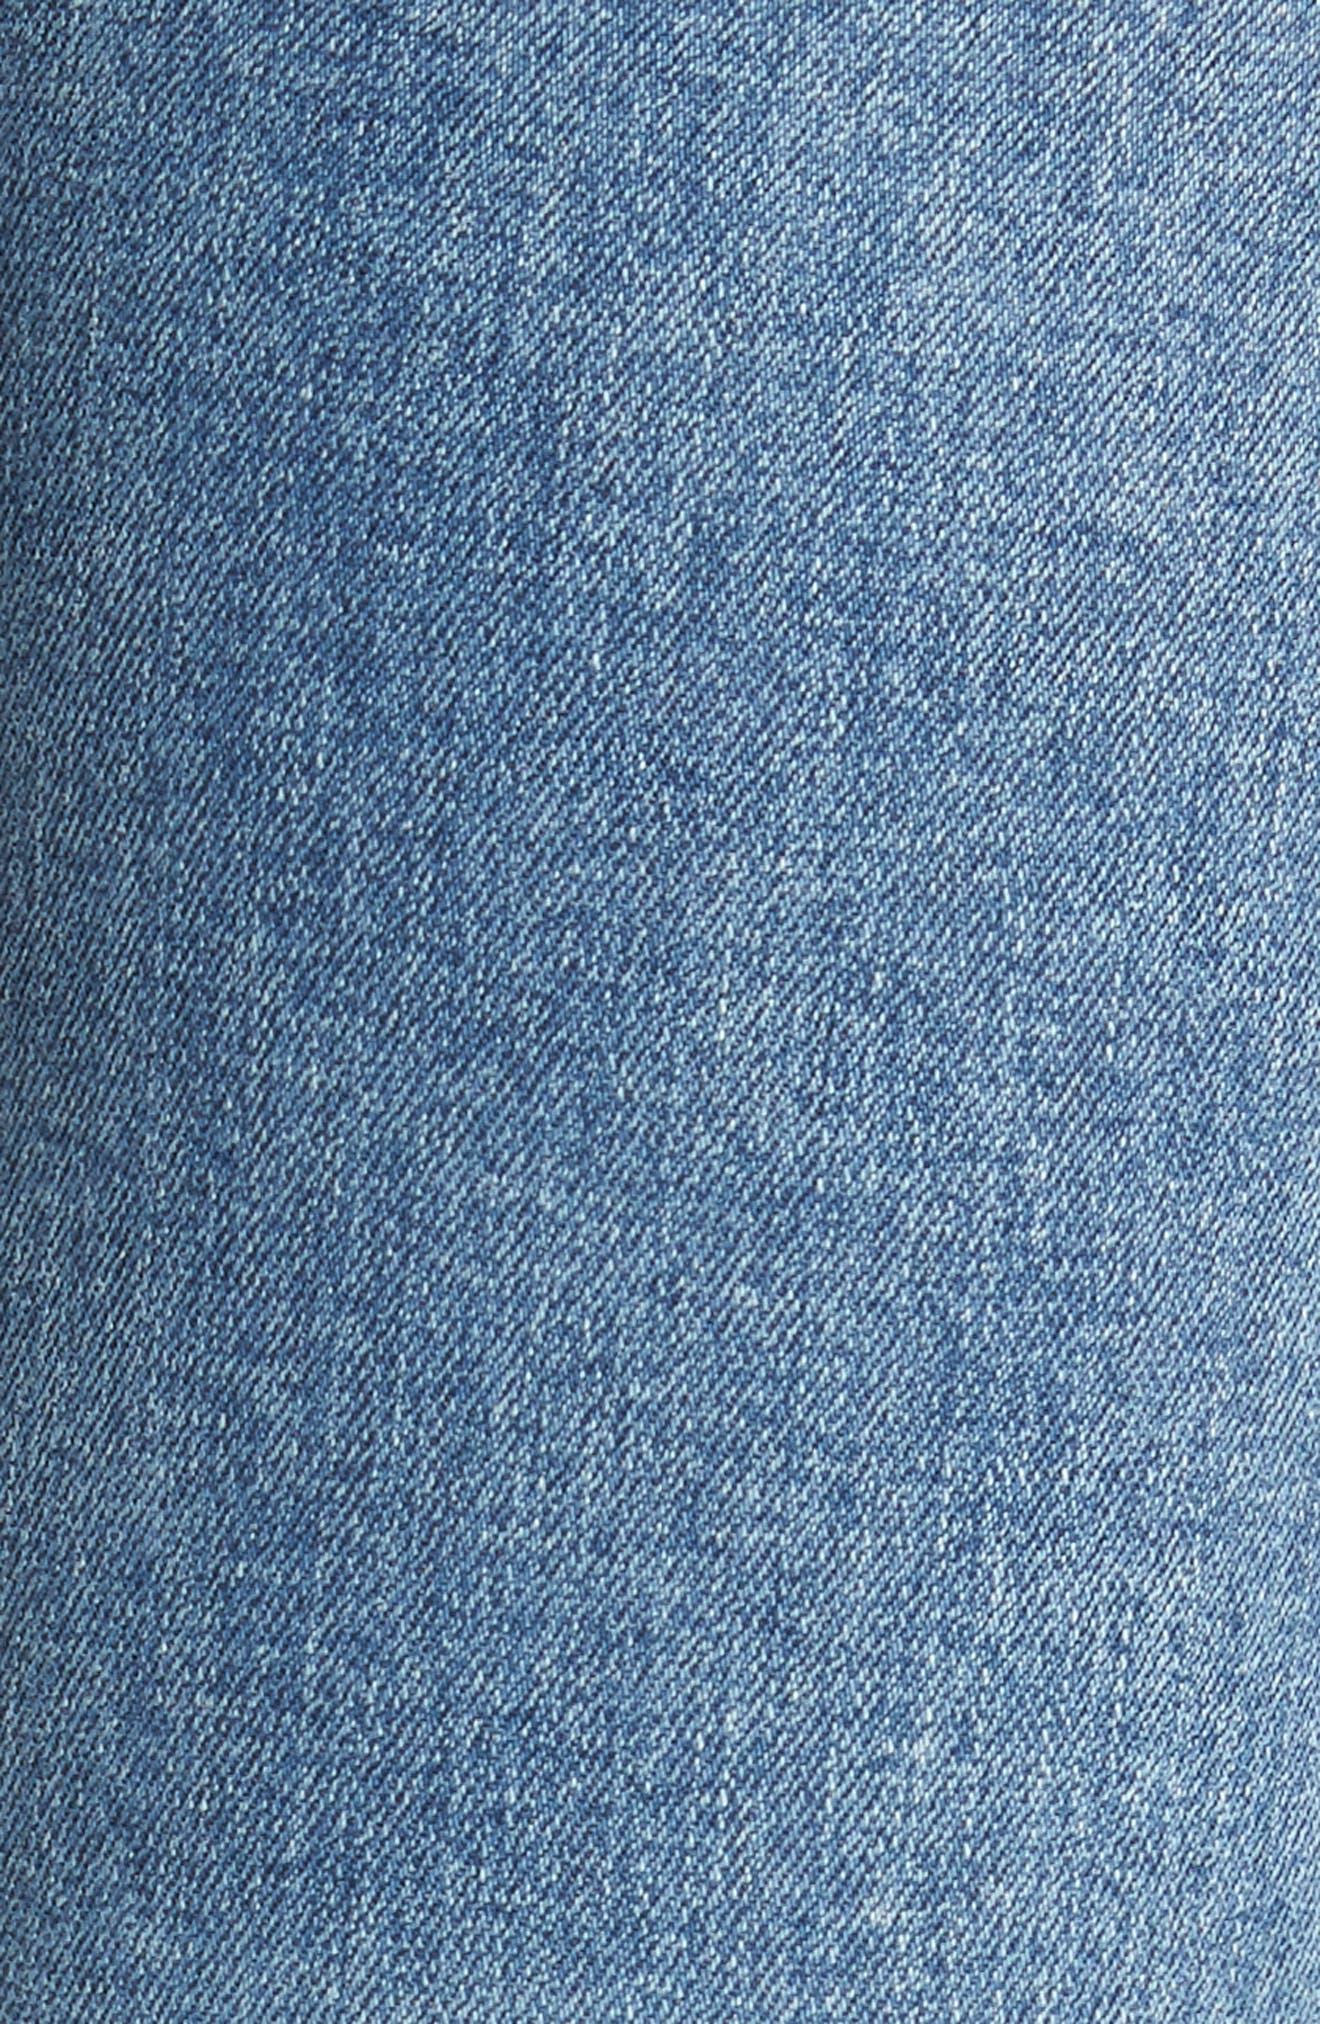 Rocket High Waist Crop Skinny Jeans,                             Alternate thumbnail 6, color,                             457